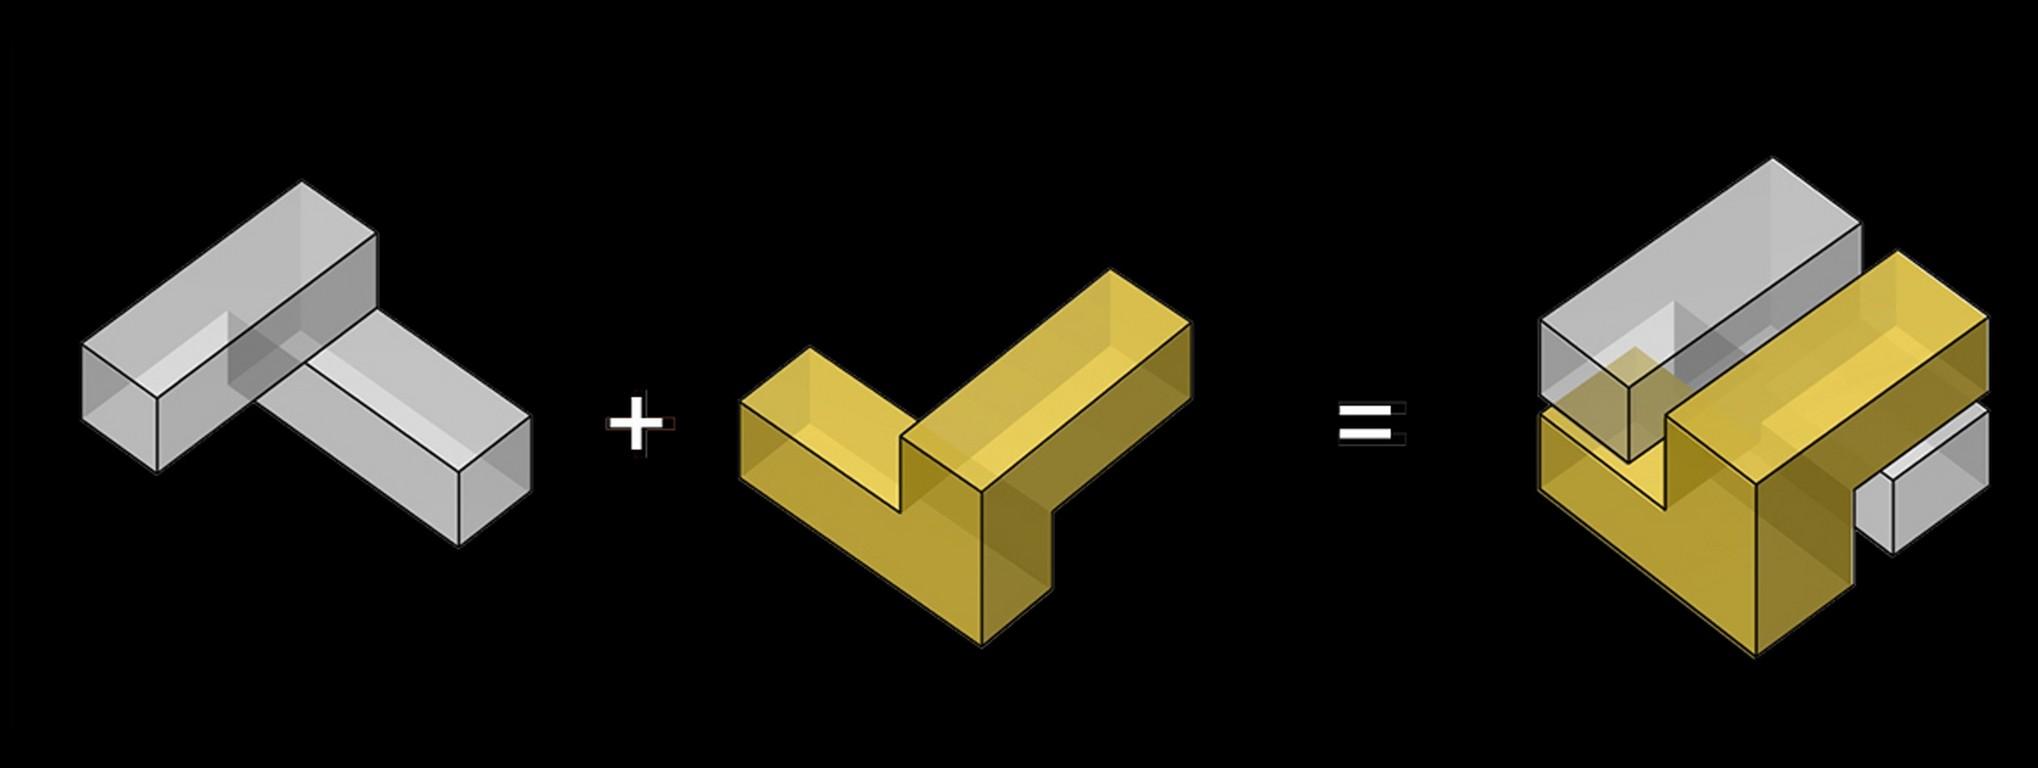 interlockingprocess   diagram      misfits  architecture